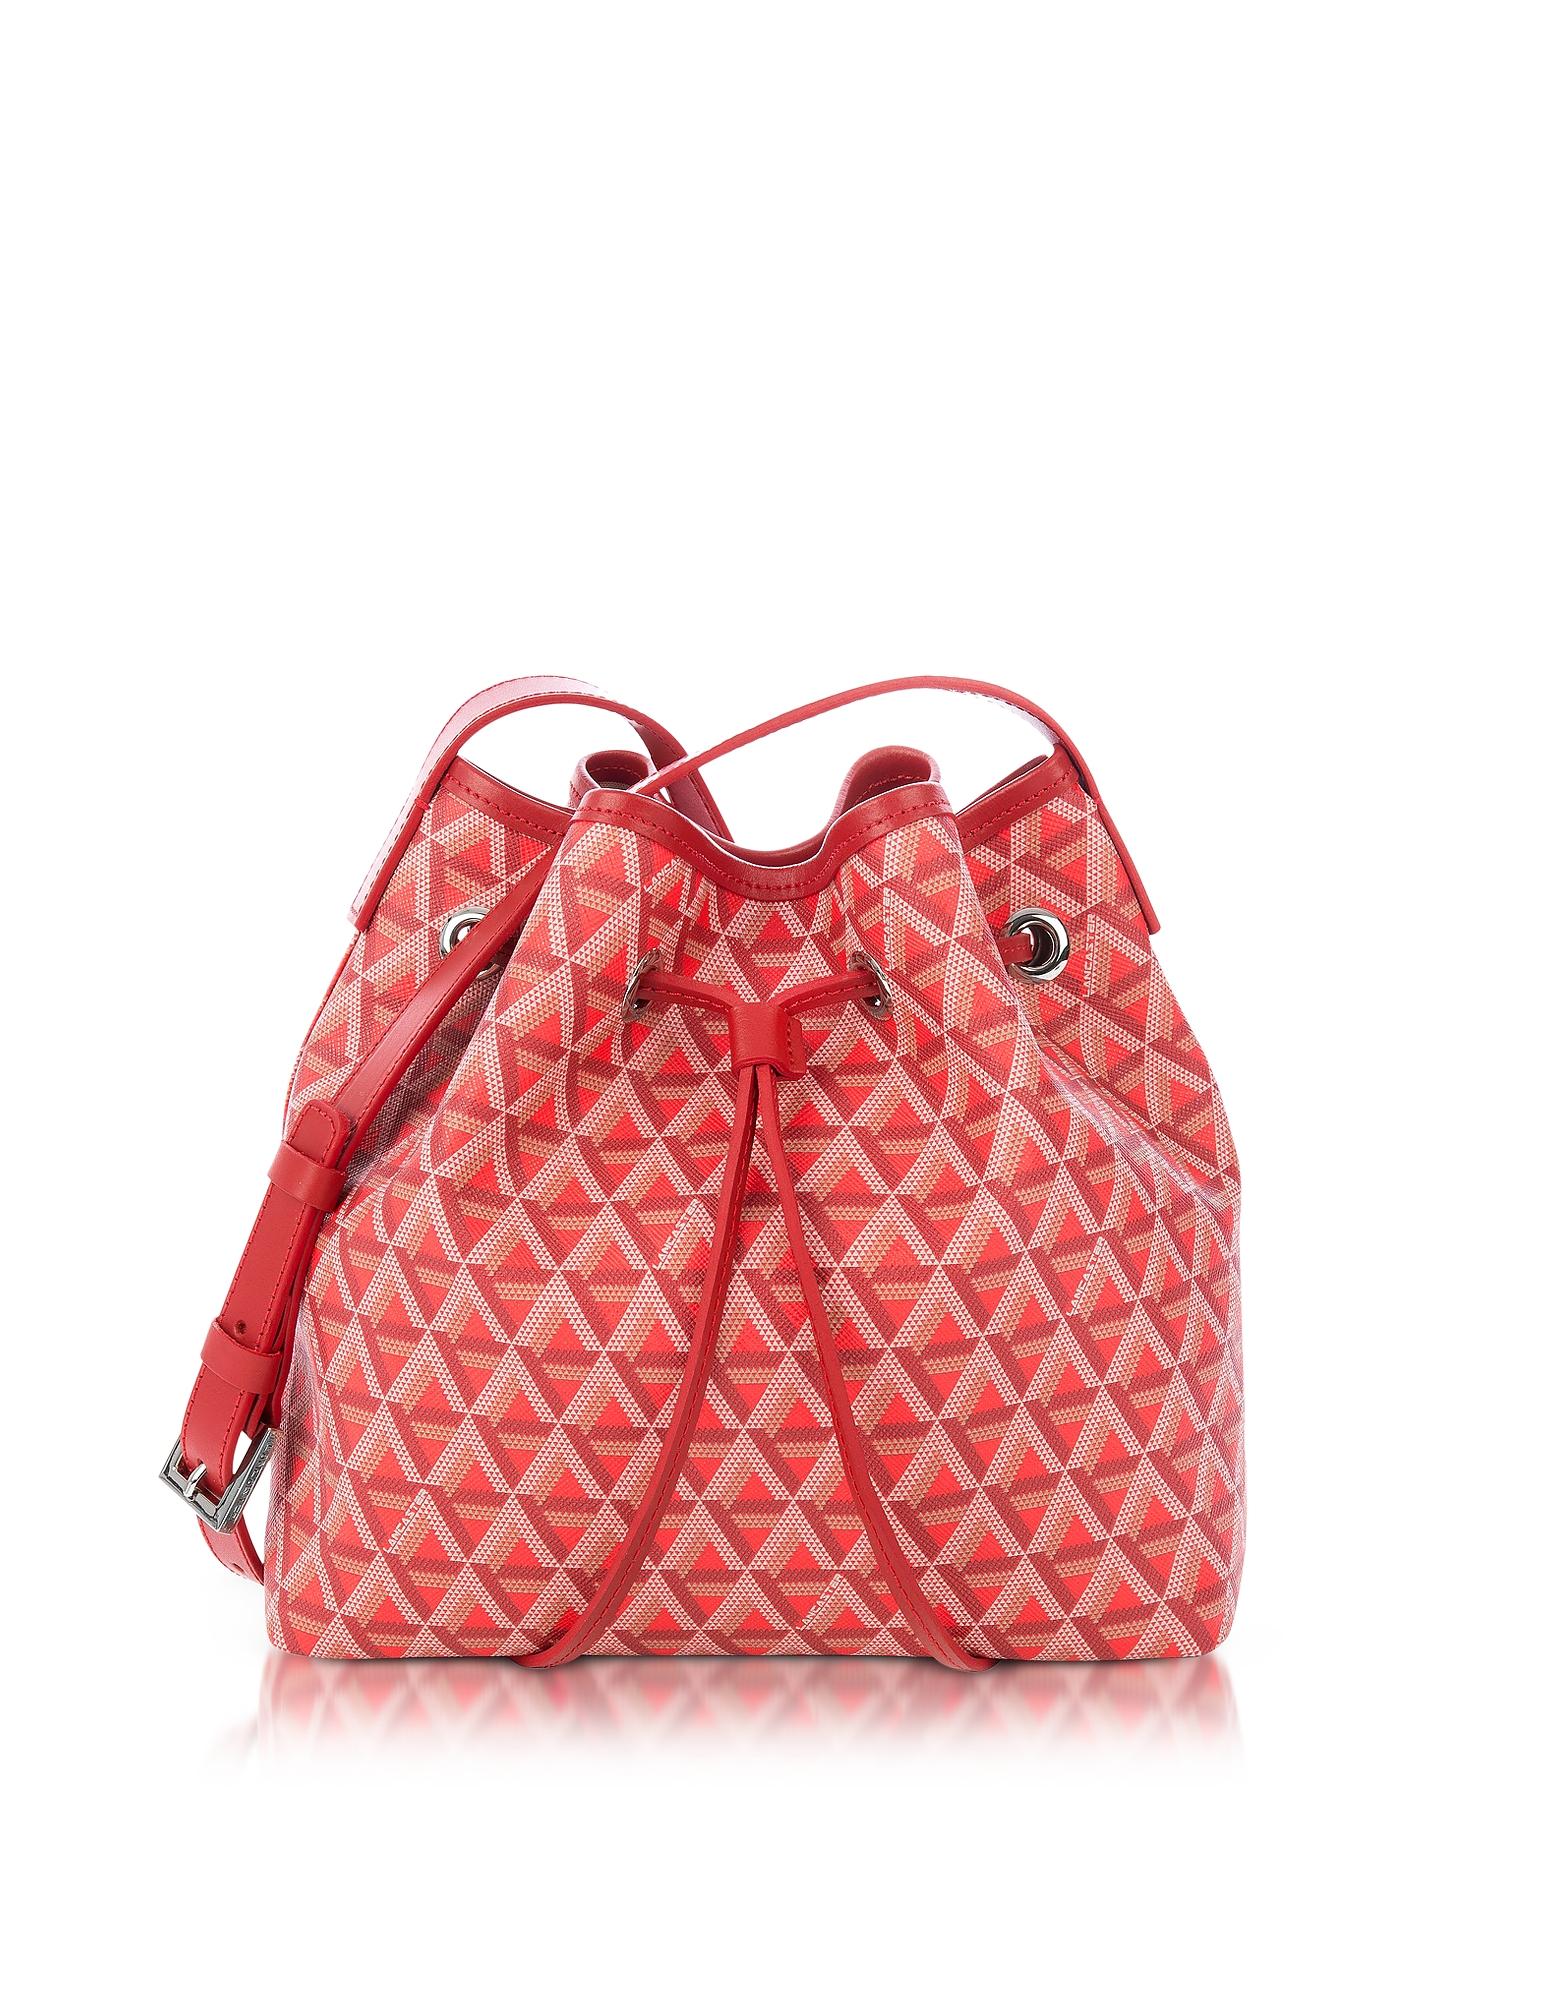 Lancaster Paris Handbags, Ikon Small Coated Canvas Bucket Bag w/Drawstring